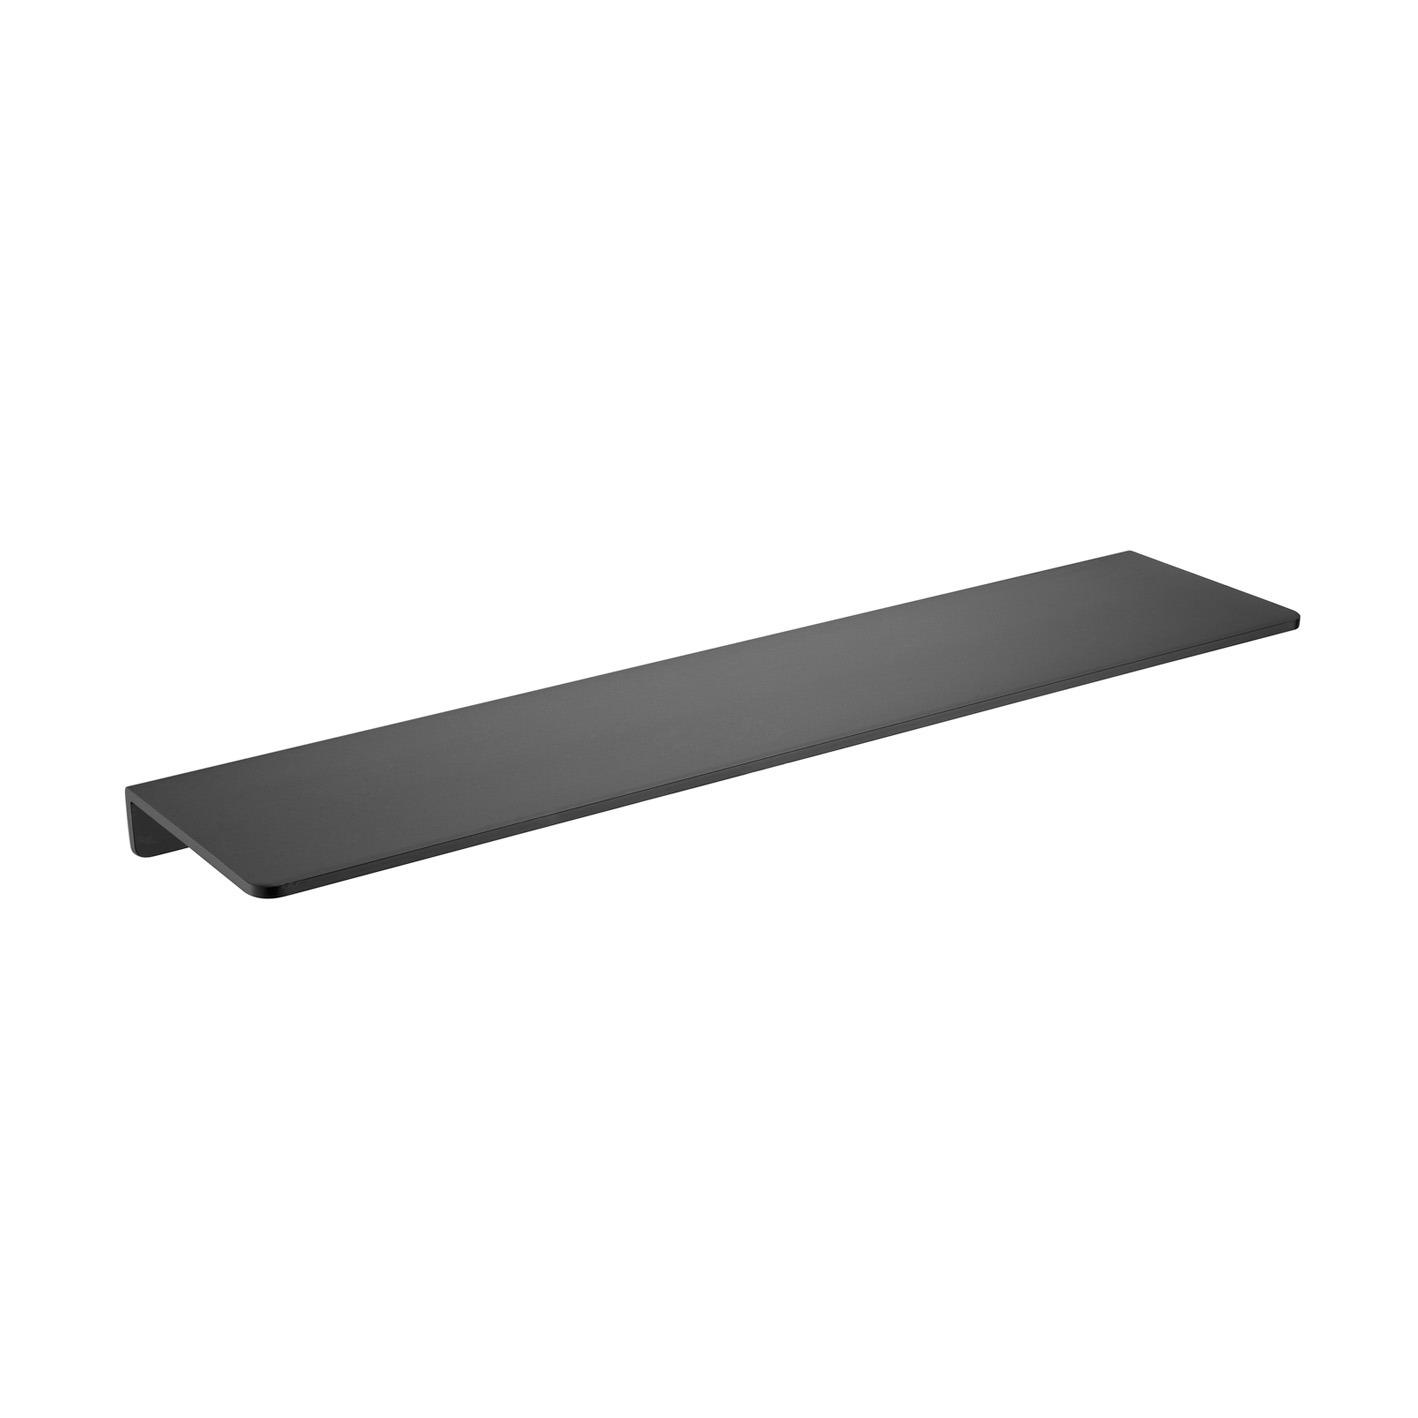 Rubine Flat Bath Shelf - Matt Black | Bathroom Sales Direct